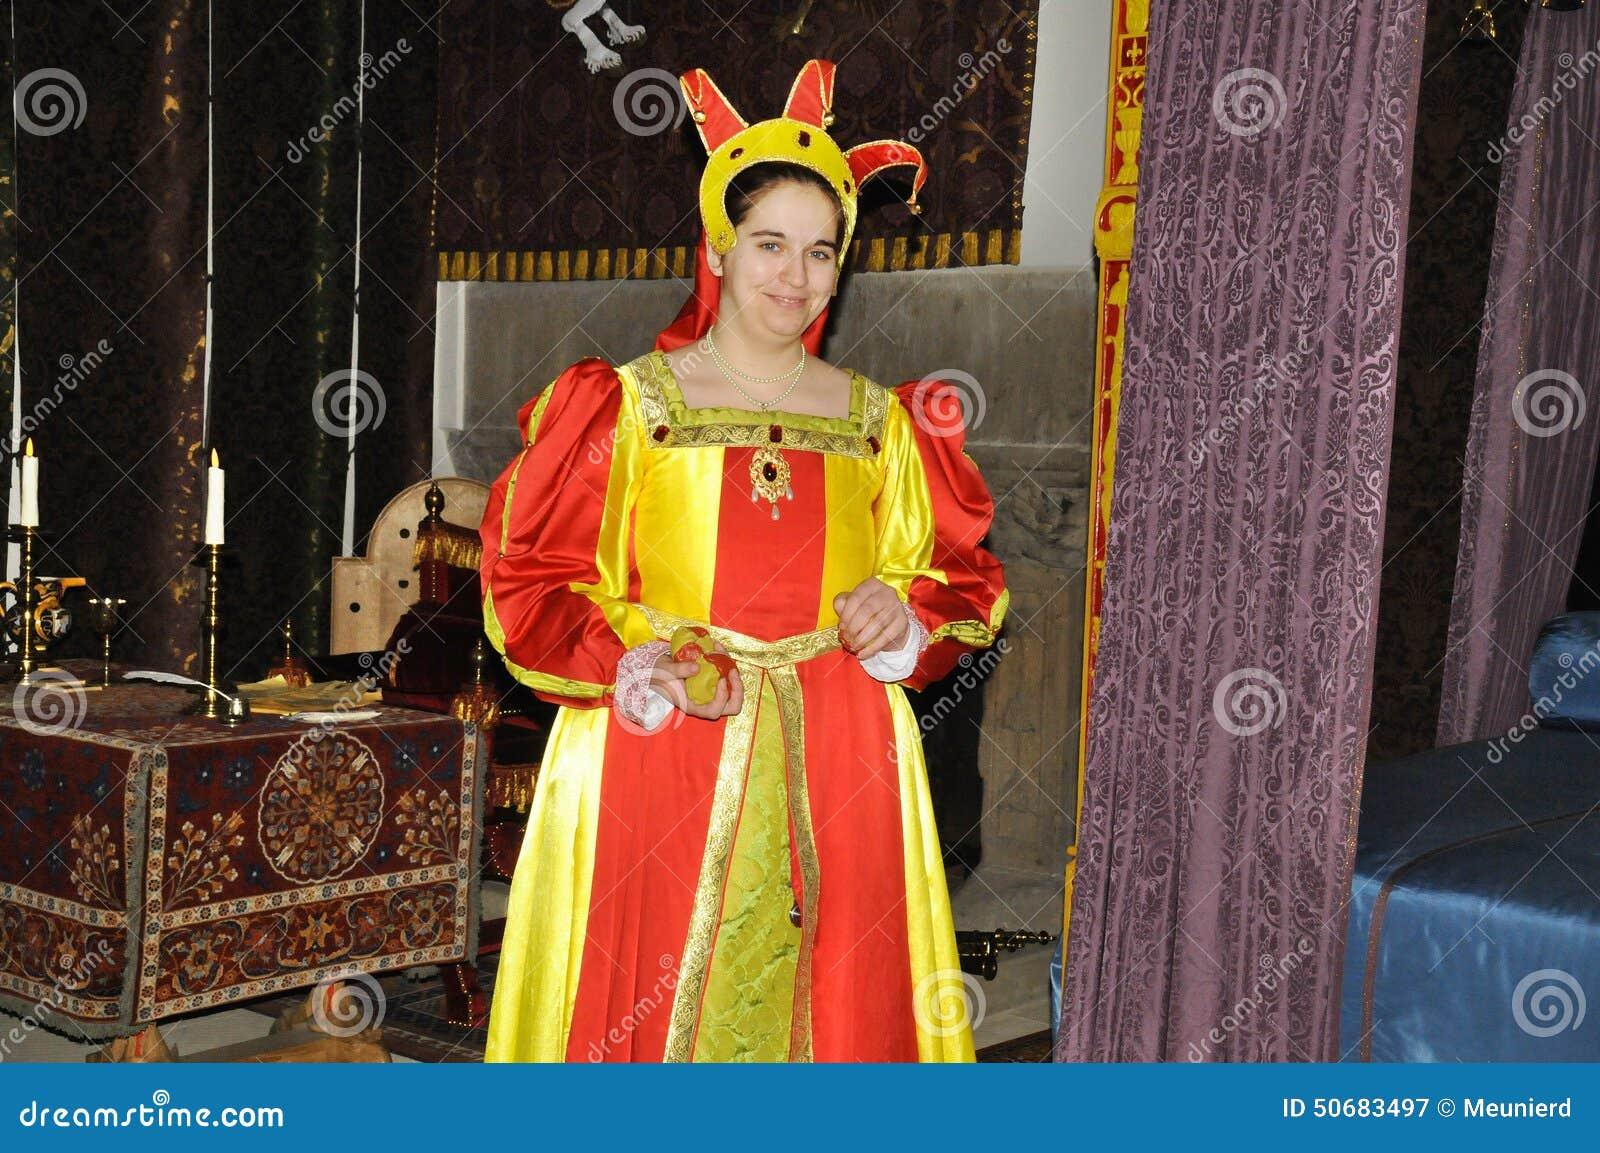 Download 礼服中世纪妇女 图库摄影片. 图片 包括有 亚瑟王的, 起斑纹, 招待, 手枪皮套, 说明, 典雅, 夫人 - 50683497